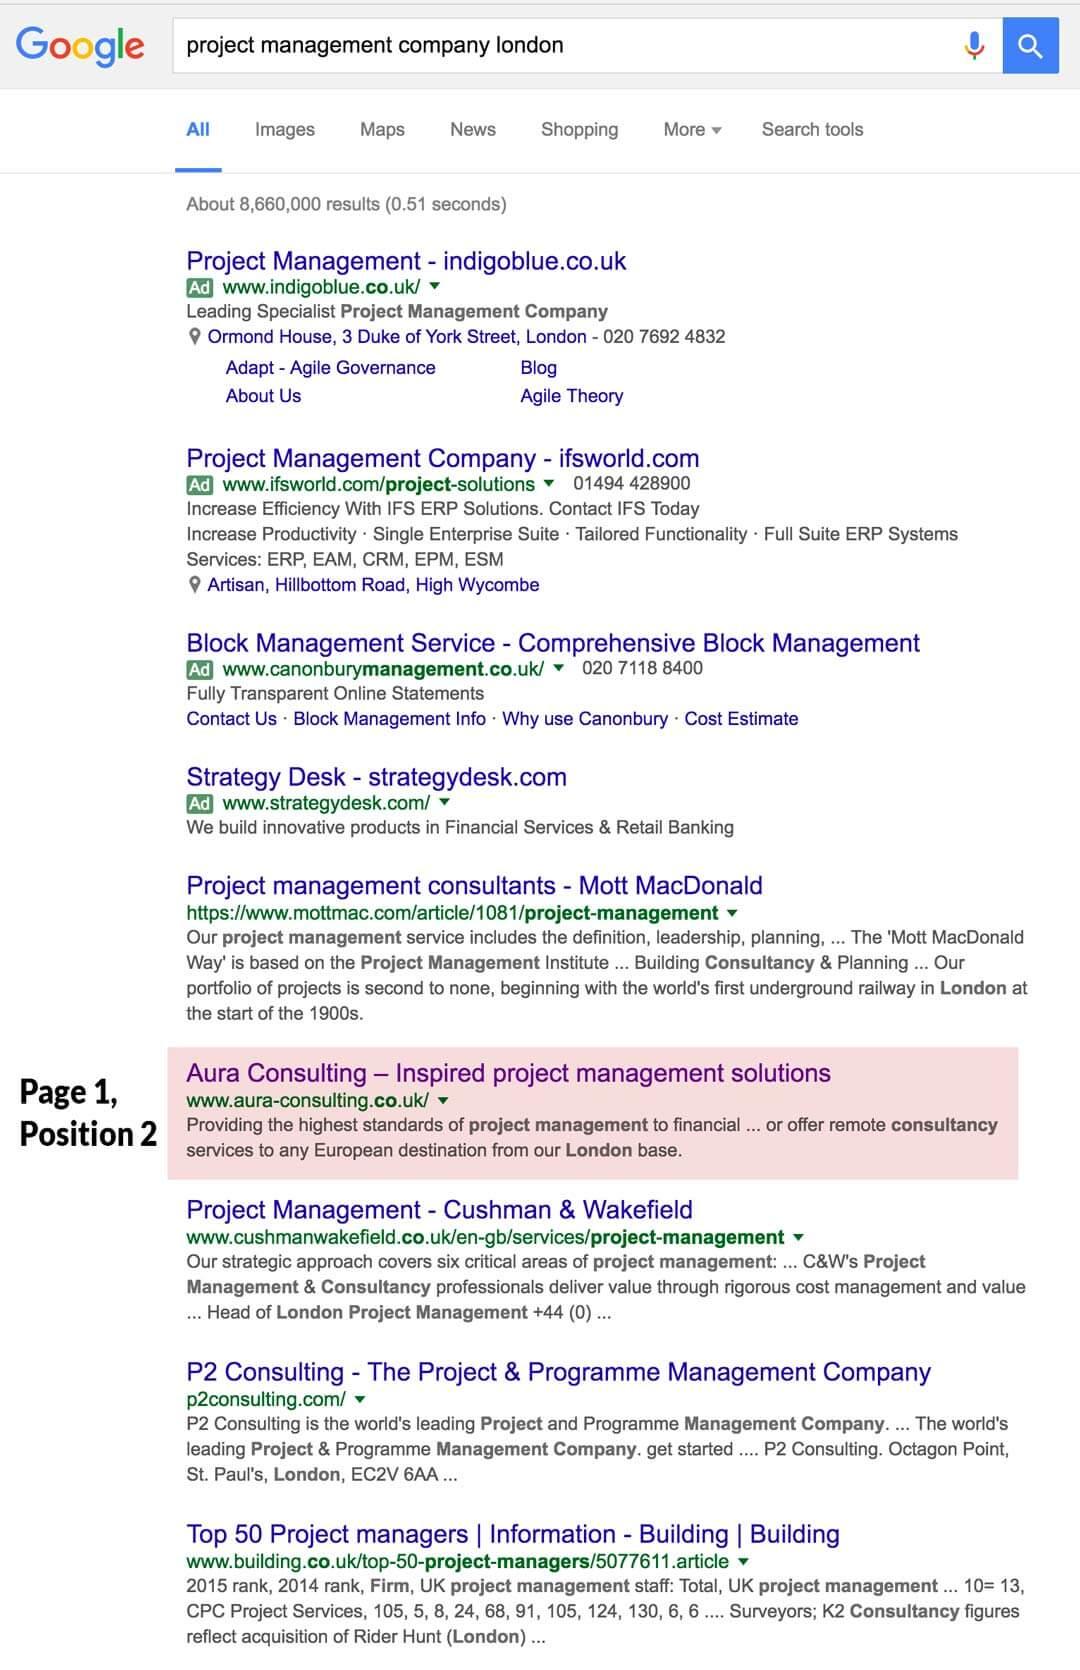 google position - project management company london